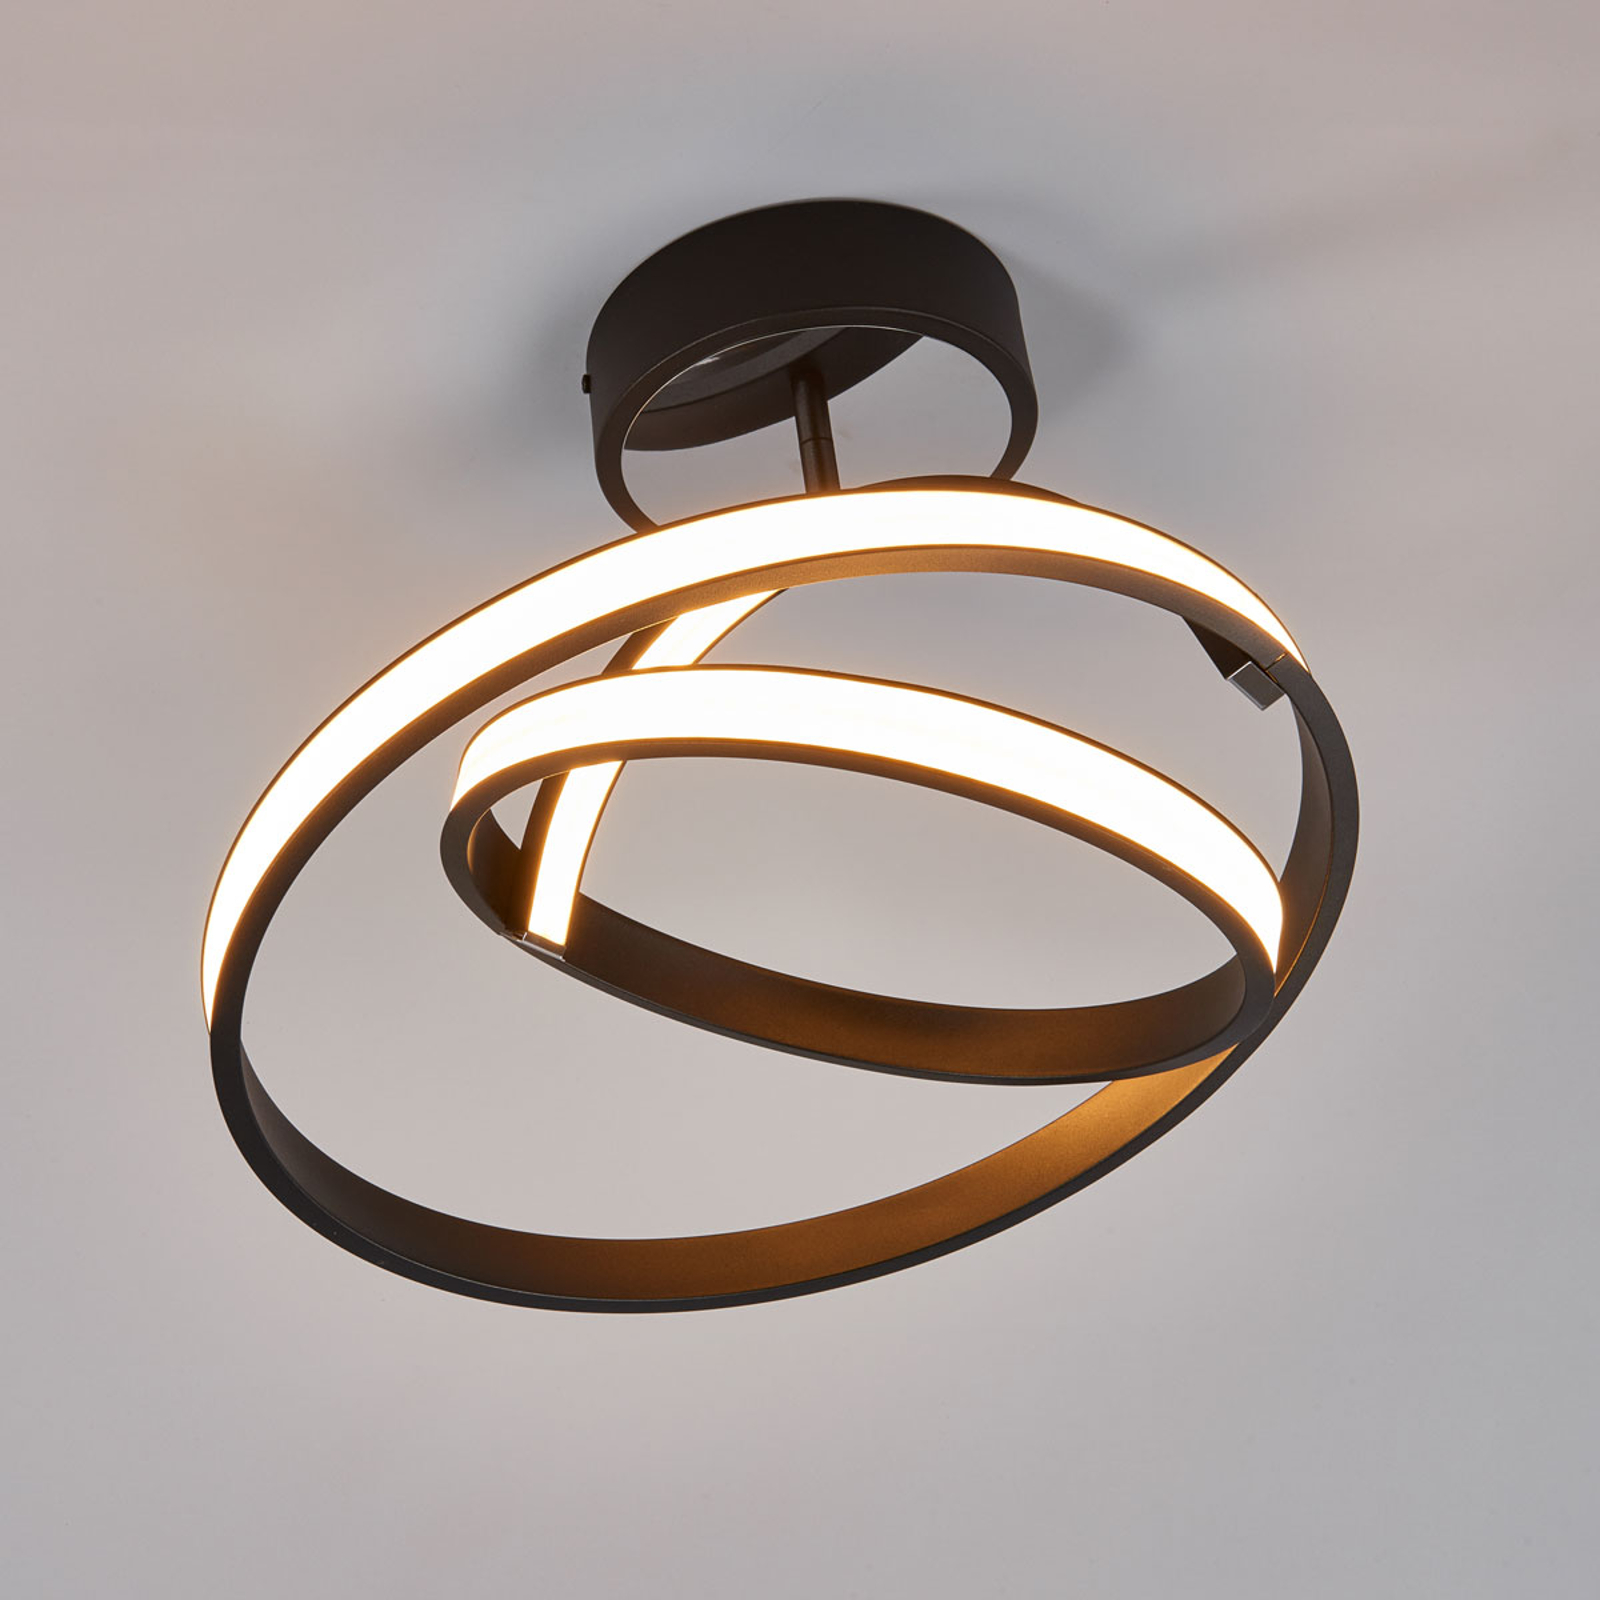 Largo - futuristisk LED taklampe i svart